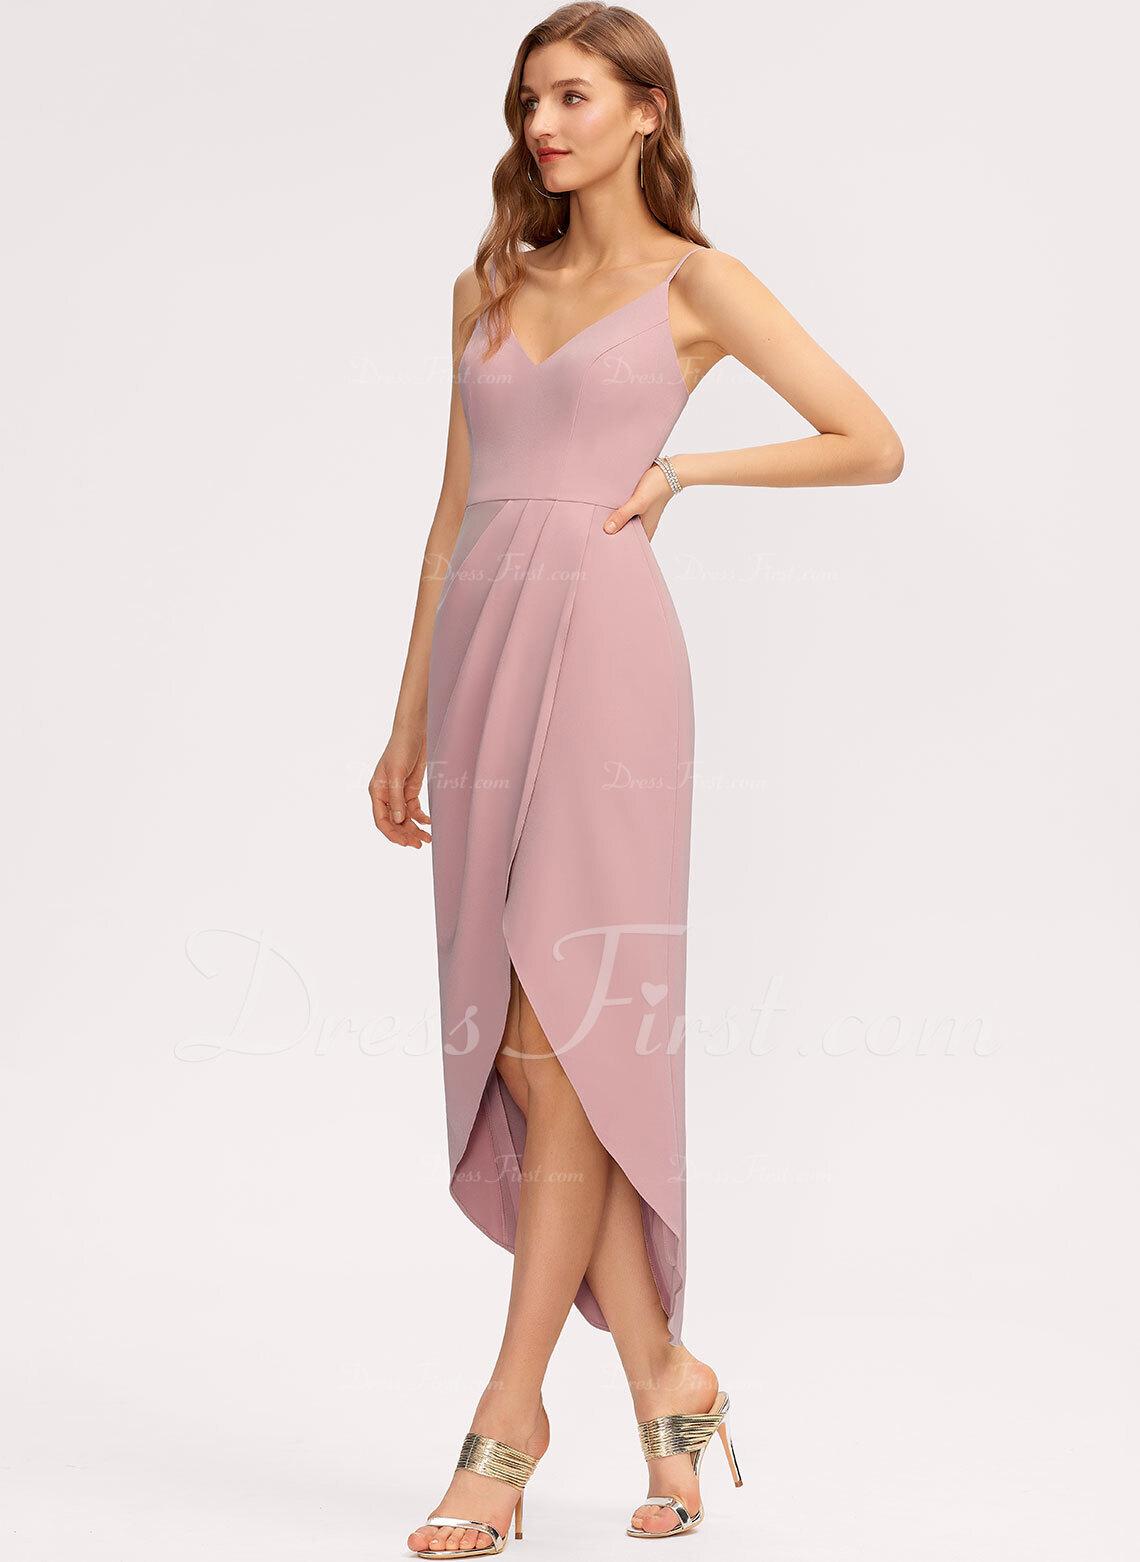 Sheath/Column V-neck Asymmetrical Stretch Crepe Bridesmaid Dress